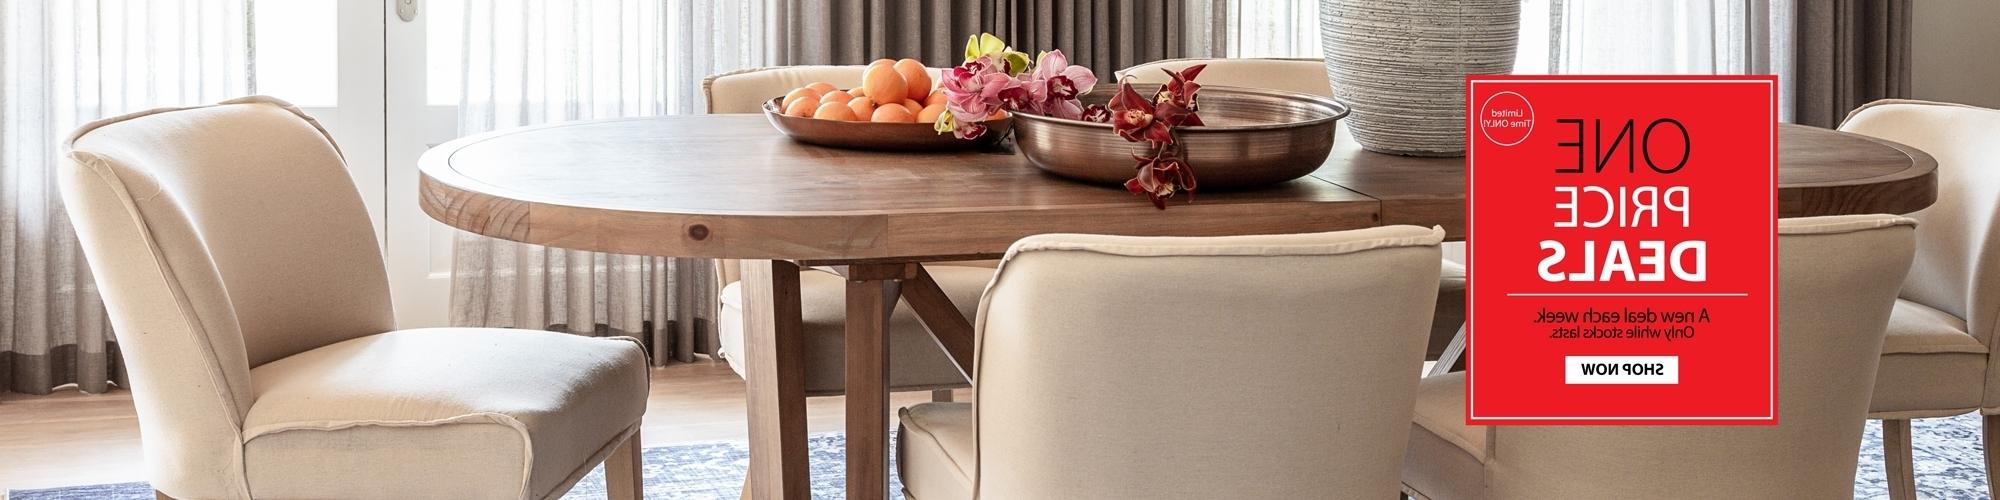 Coricraft Regarding Most Popular Dining Room Suites (View 7 of 25)